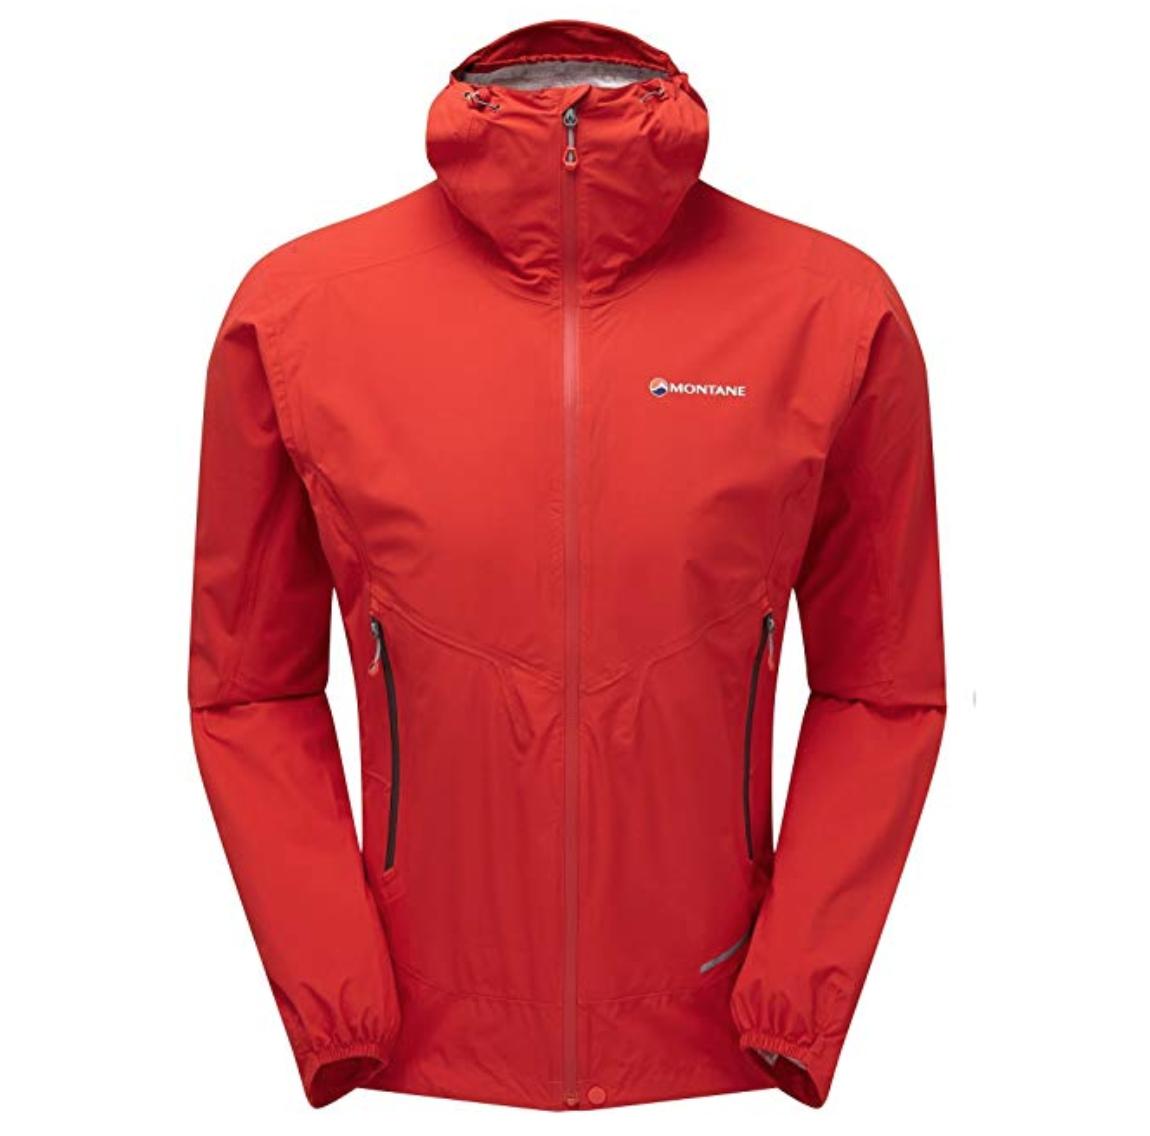 Montane Minimum Stretch Ultra Jacket - Best Women's Summer Running Jackets